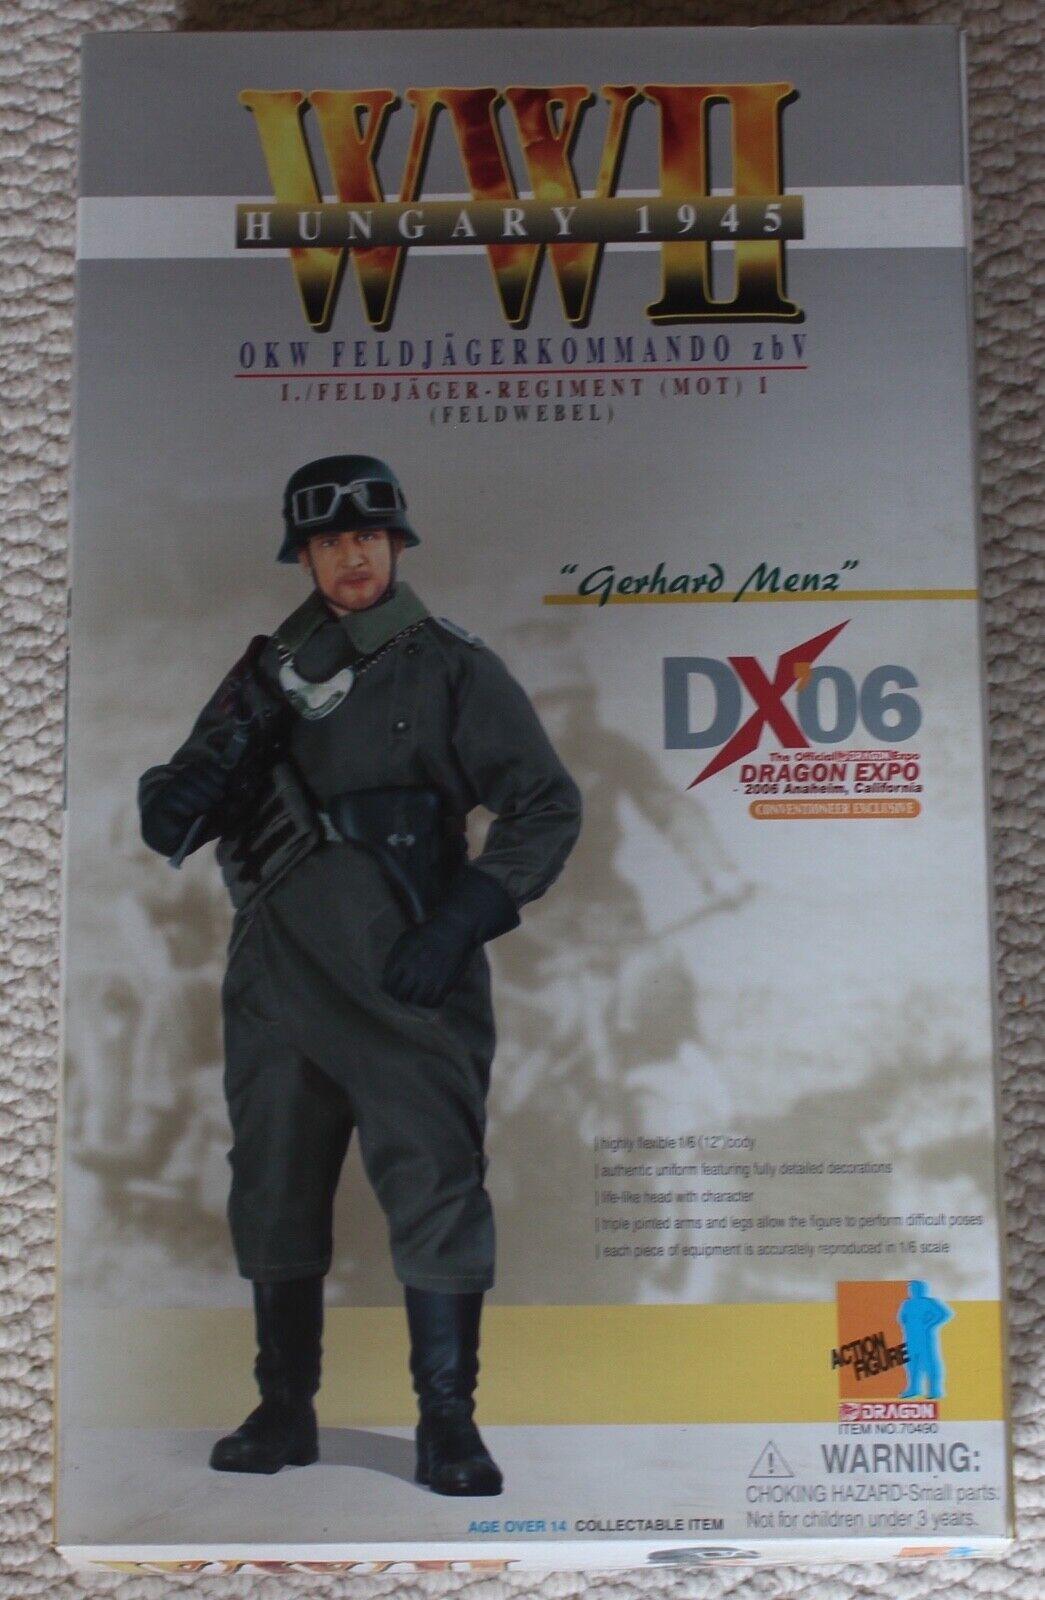 Dragon action figure ww11 gerhard Siez 1 6 12'' 70490 did cyber hot toy